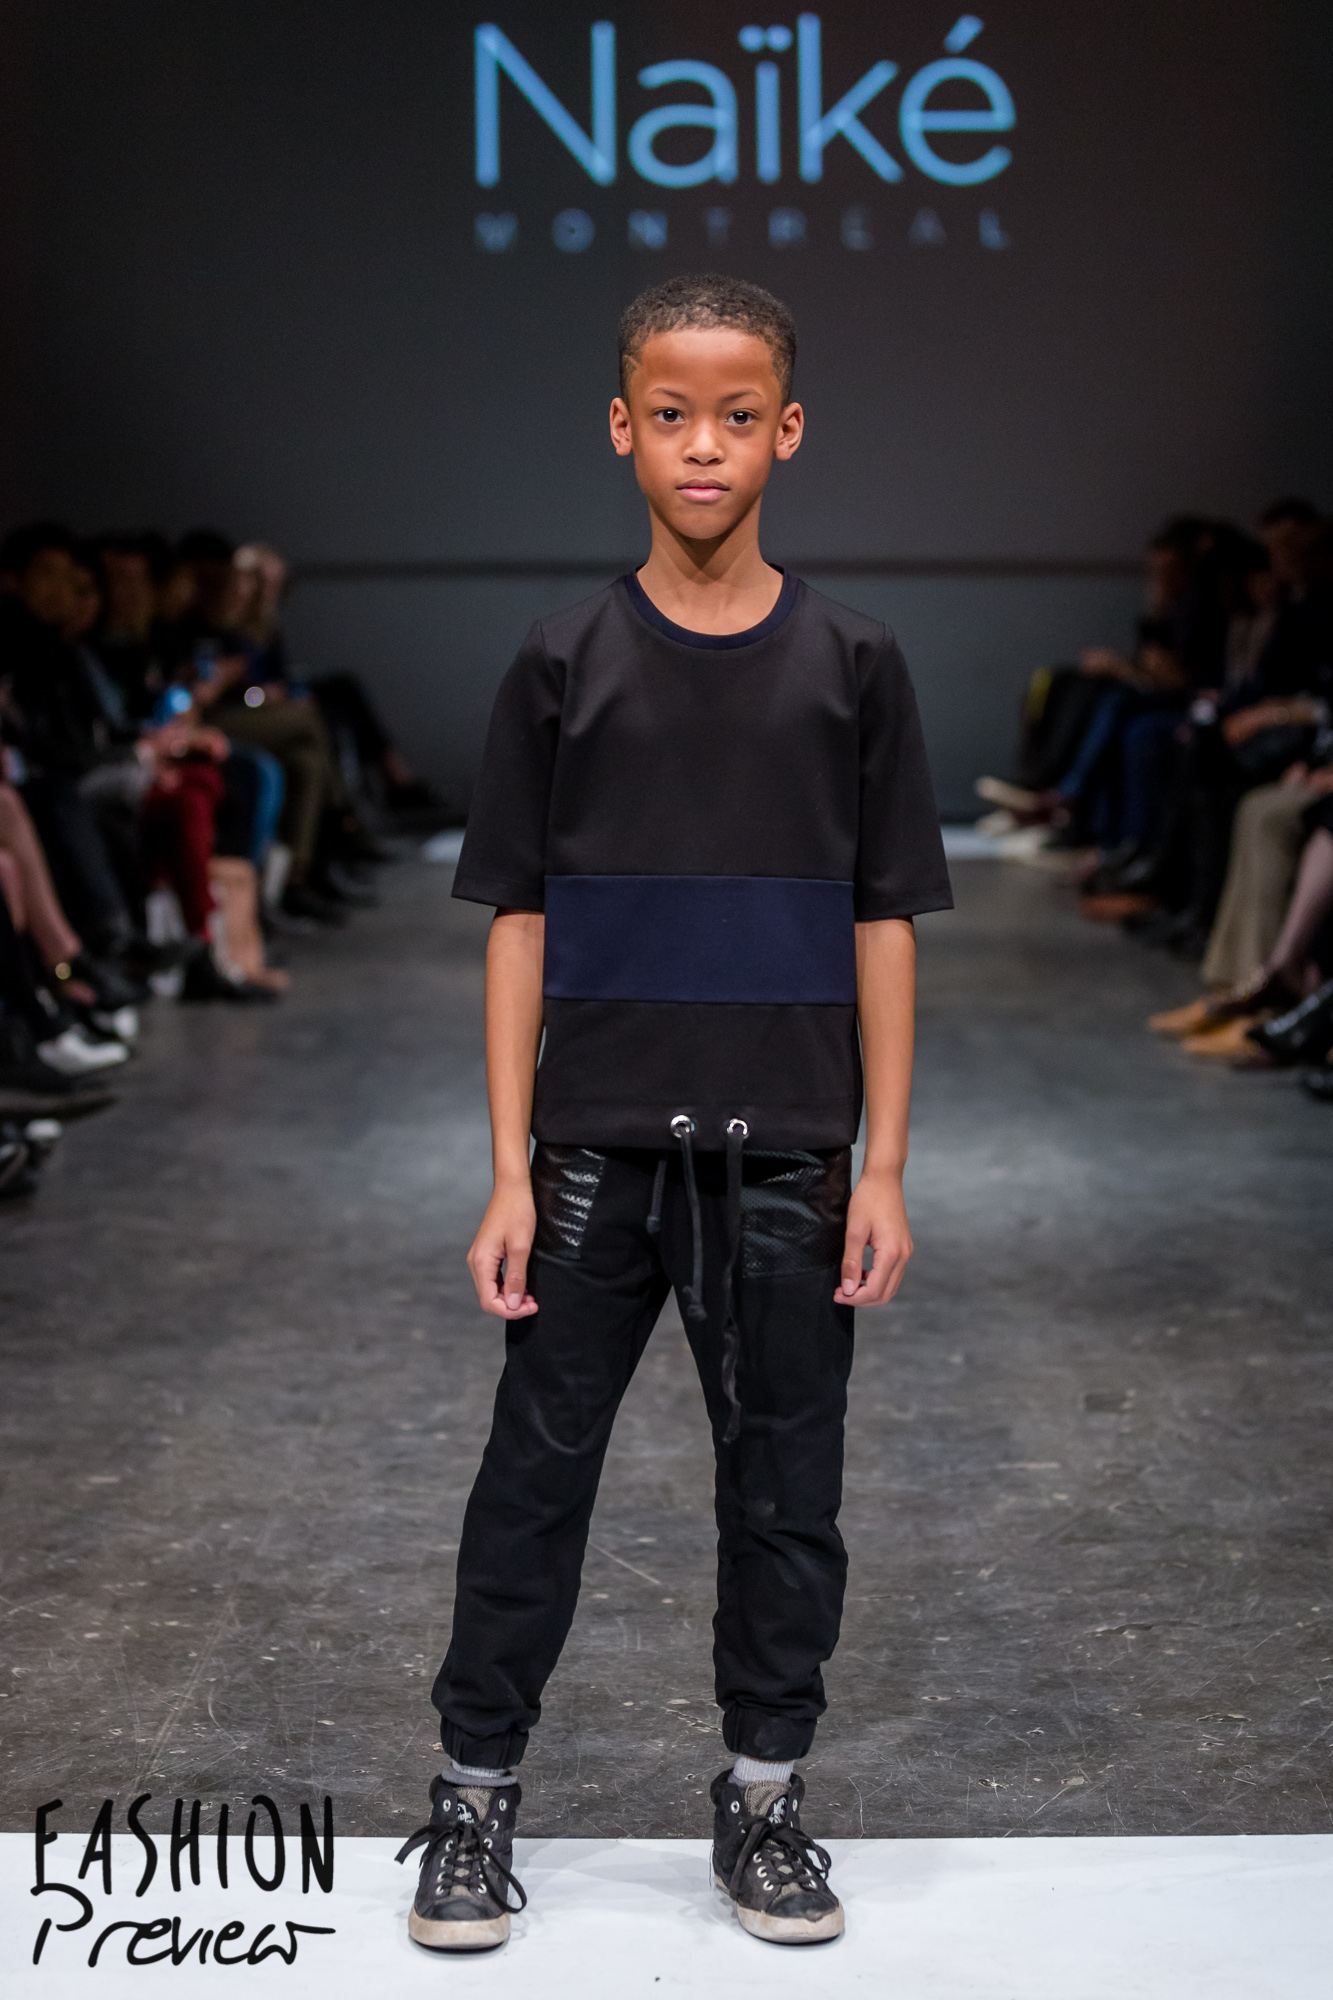 Fashion Preview 9 - Naike-20.jpg